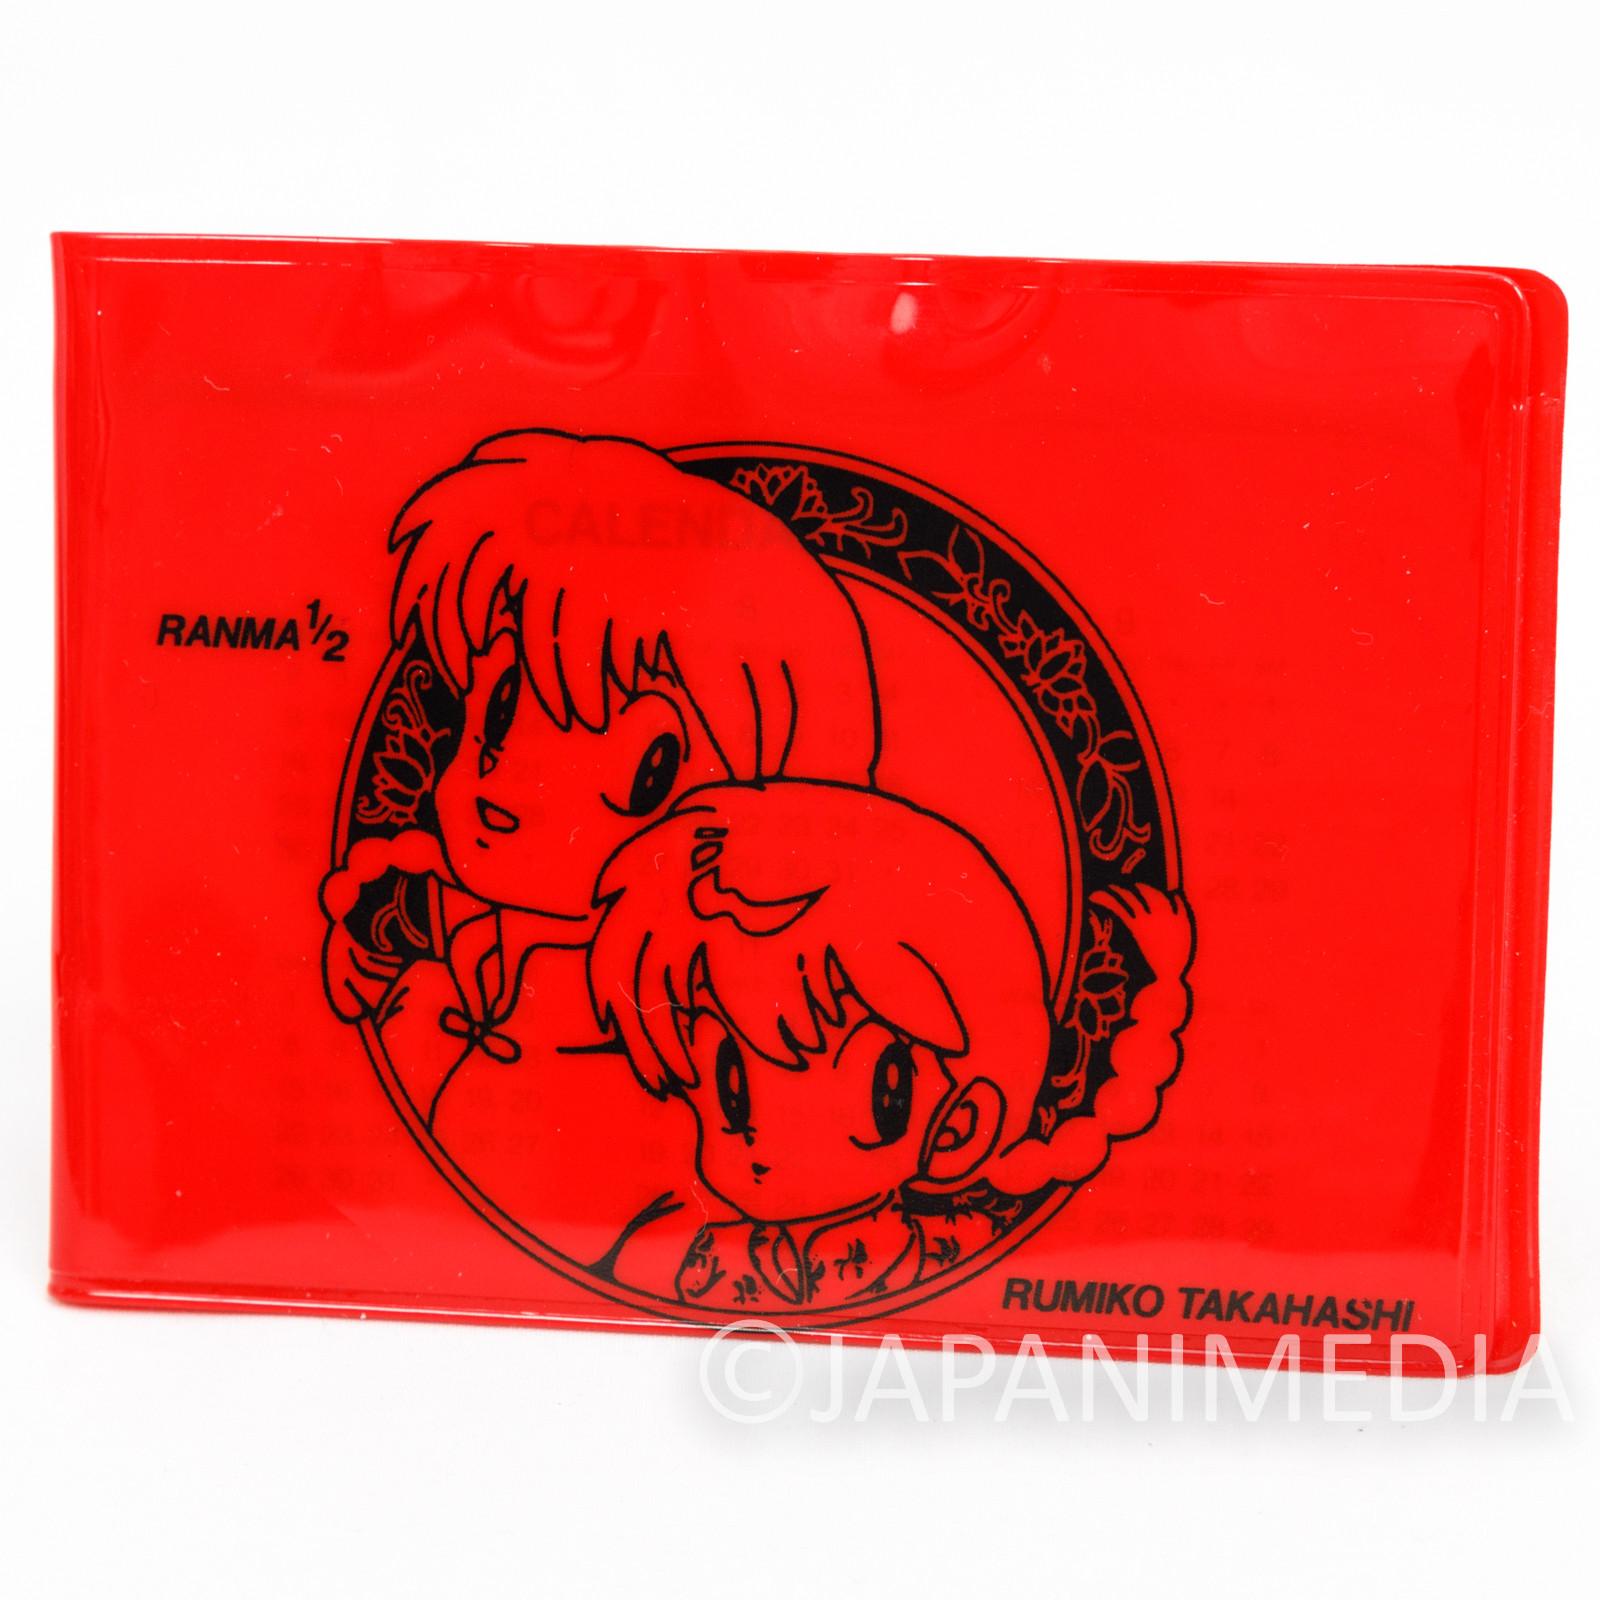 Ranma 1/2 Pass Card Case Holder w/Calendar Paper & Memo Pad RUMIKO TAKAHASHI